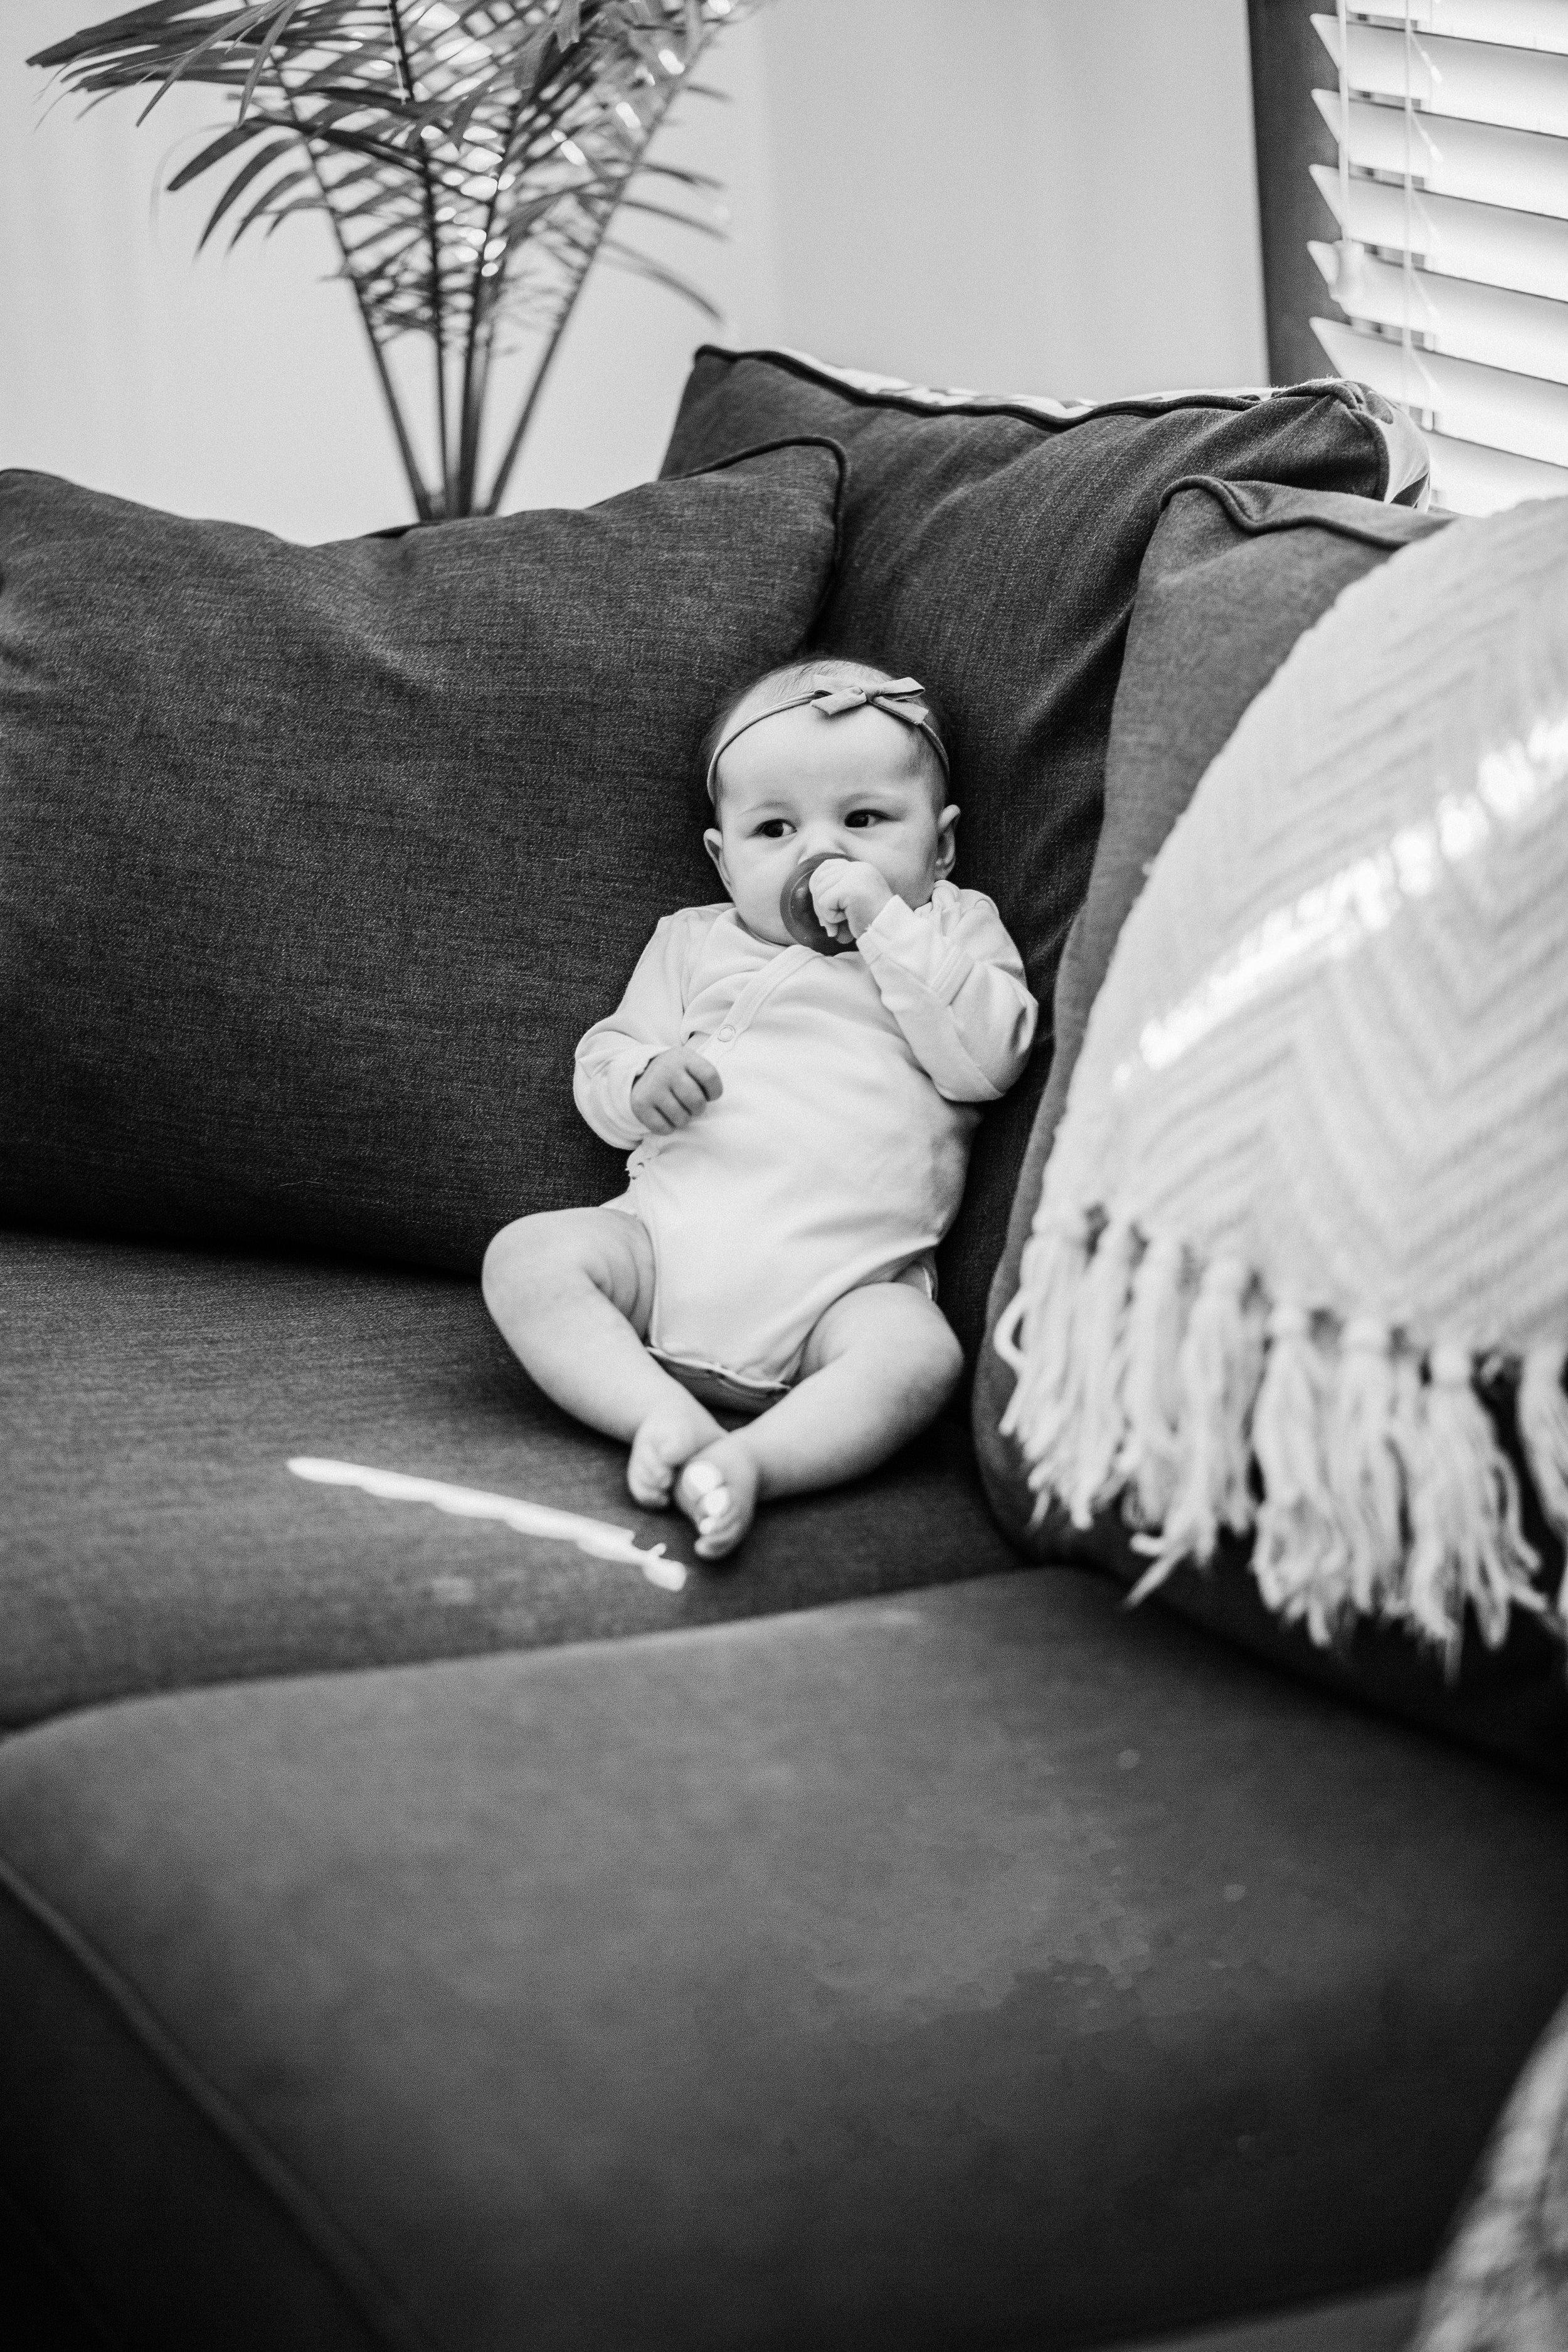 st louis lifestyle photographer, missouri lifestyle photographer, st louis lifestyle photography, missouri newborn photographer, lifestyle photo ideas, st louis newborn photographer, newborn photos